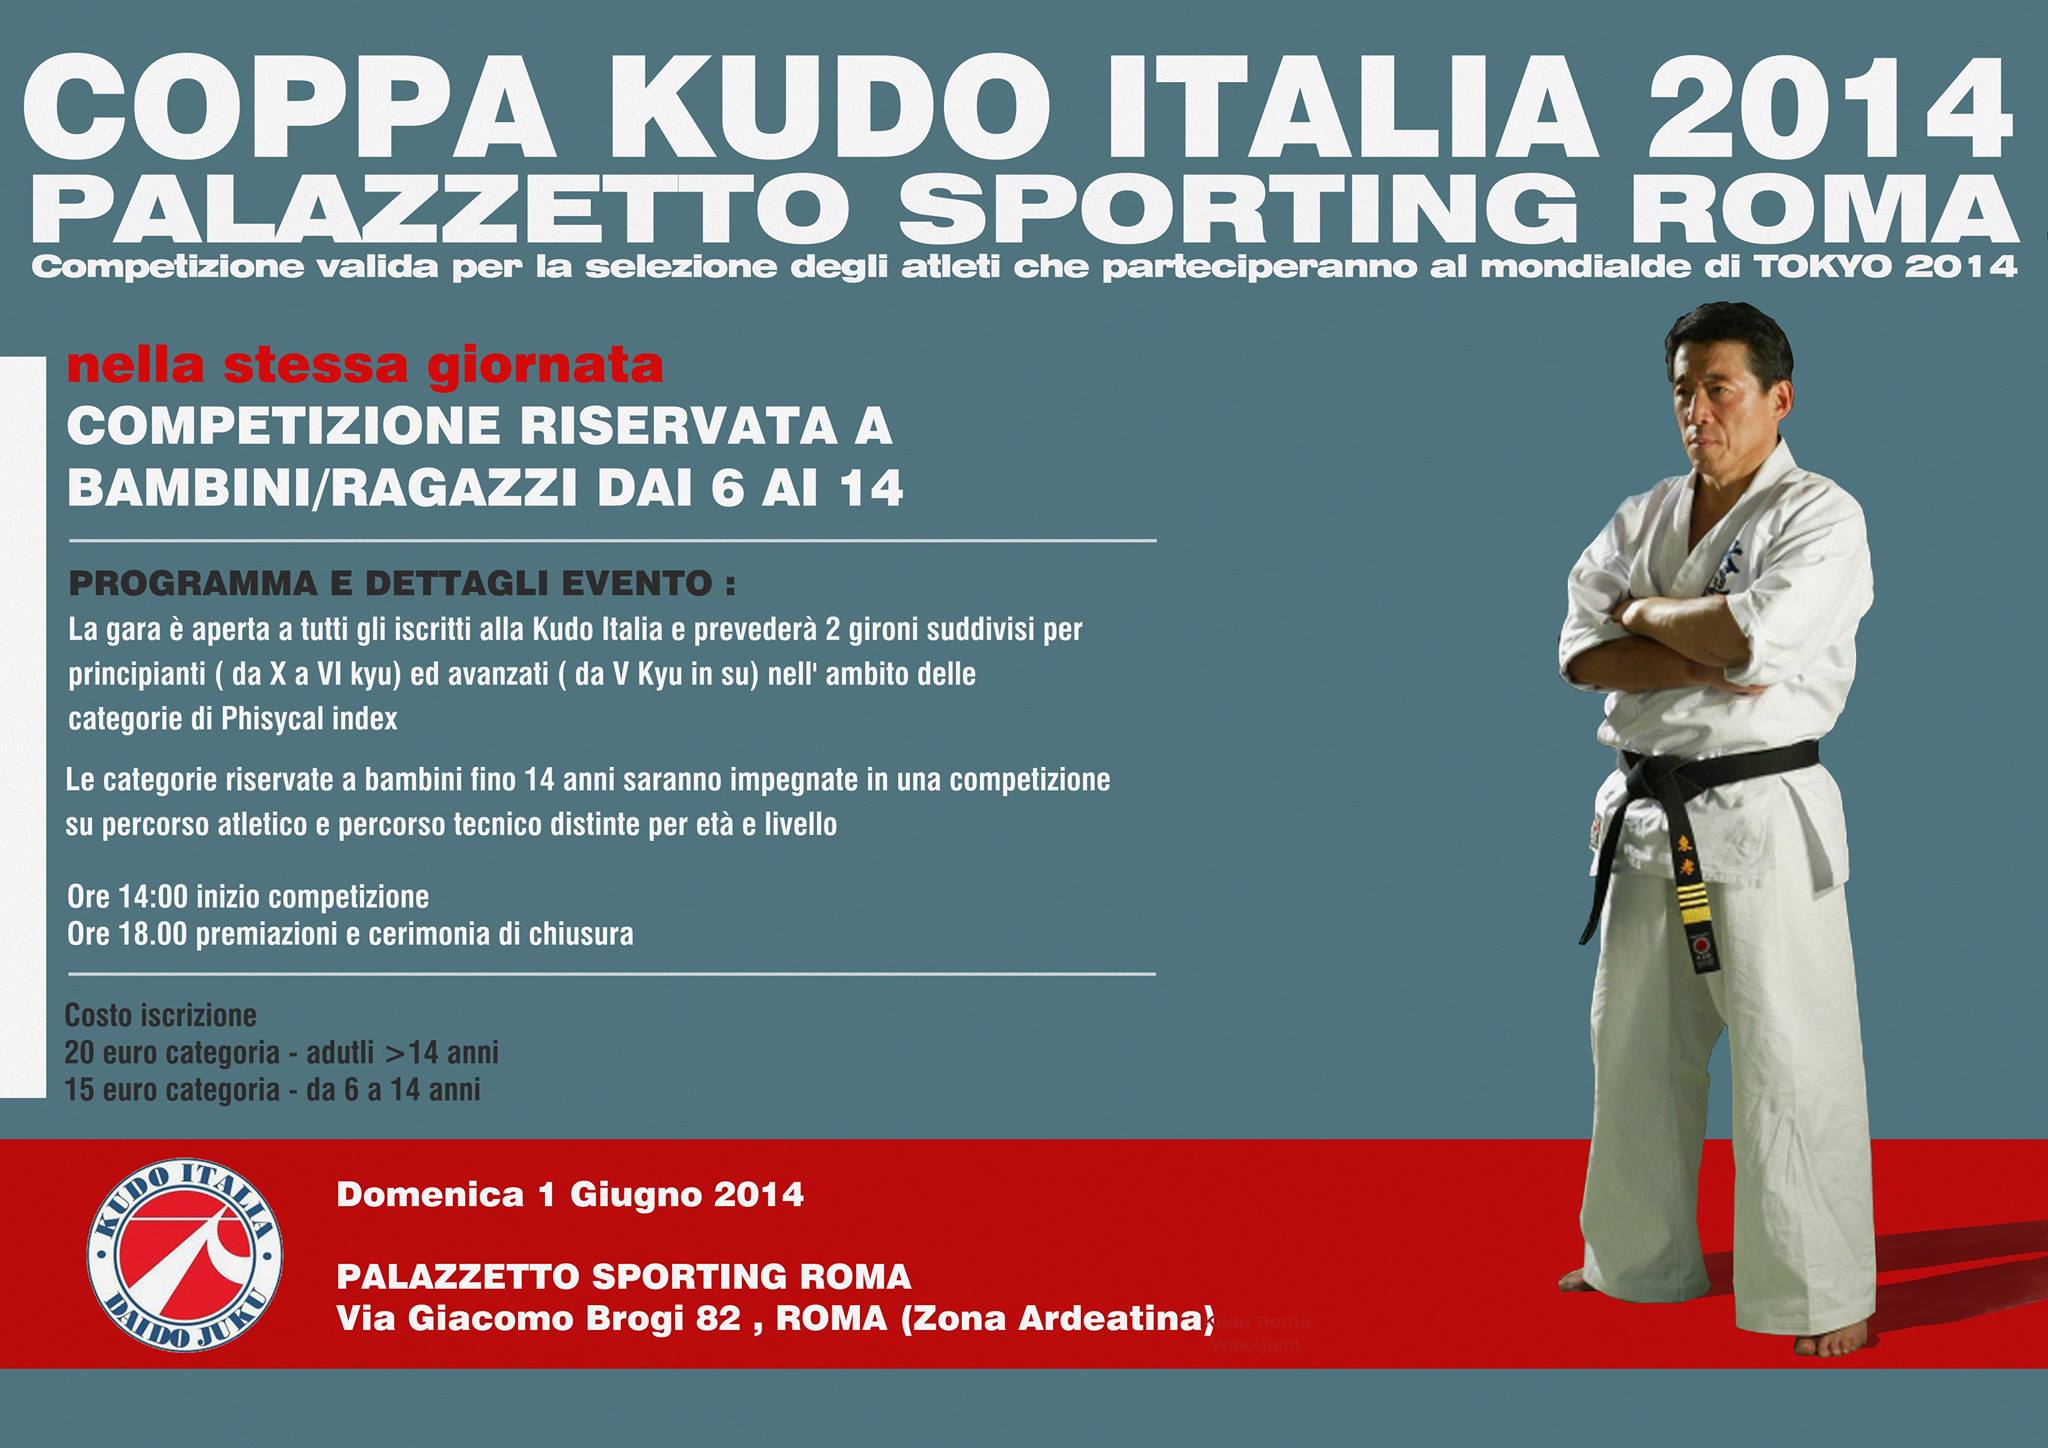 coppakudoitalia2014 Kudo Italia